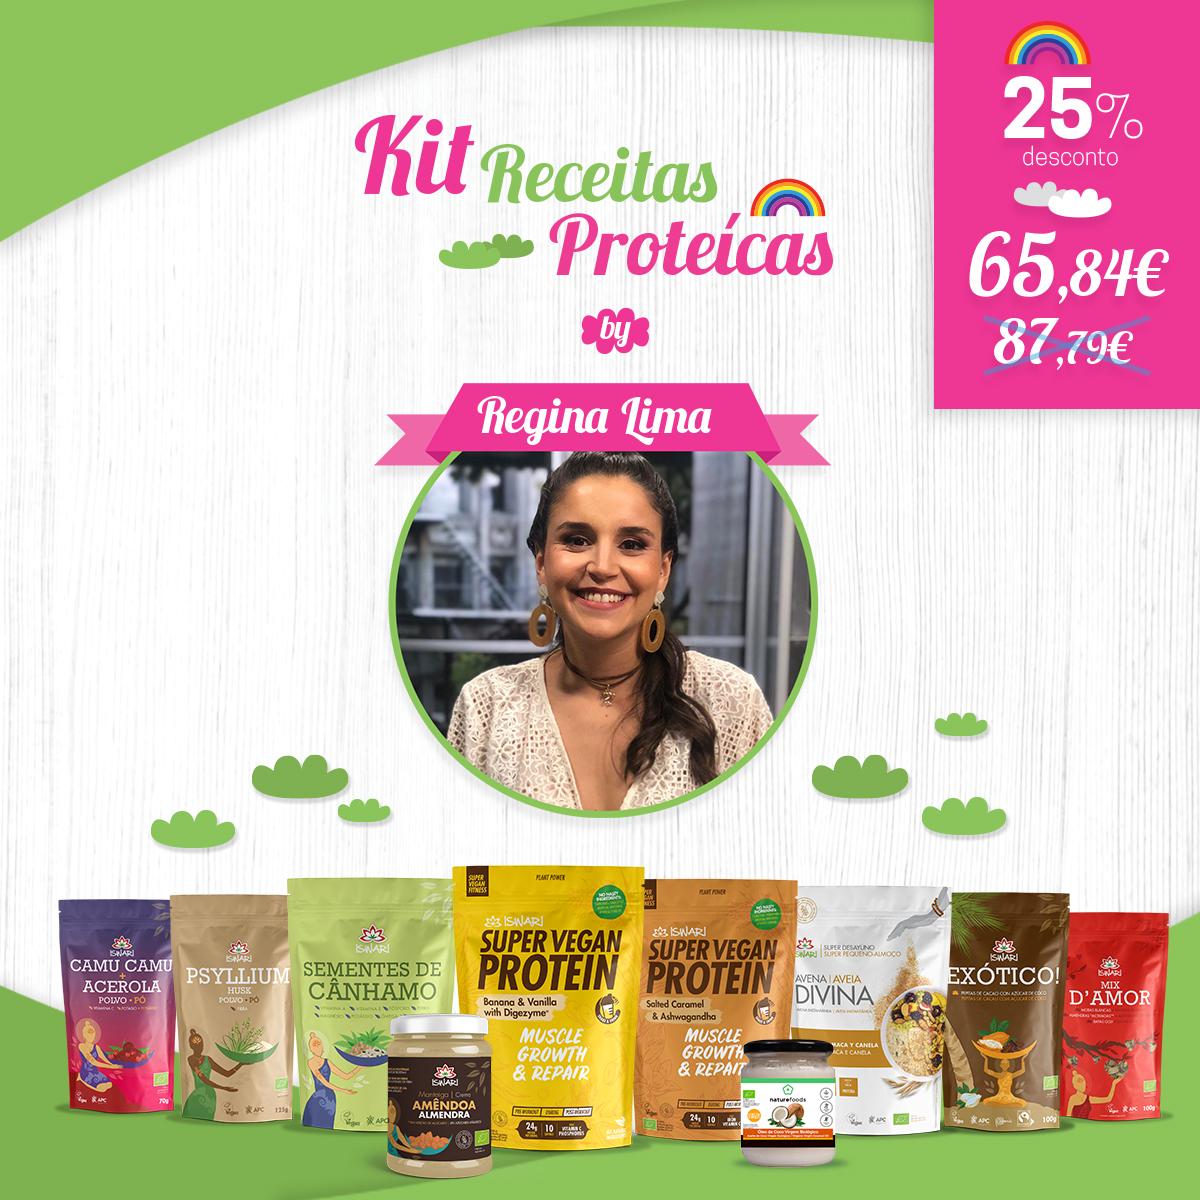 Kit Receitas proteicas by Regina lima 1